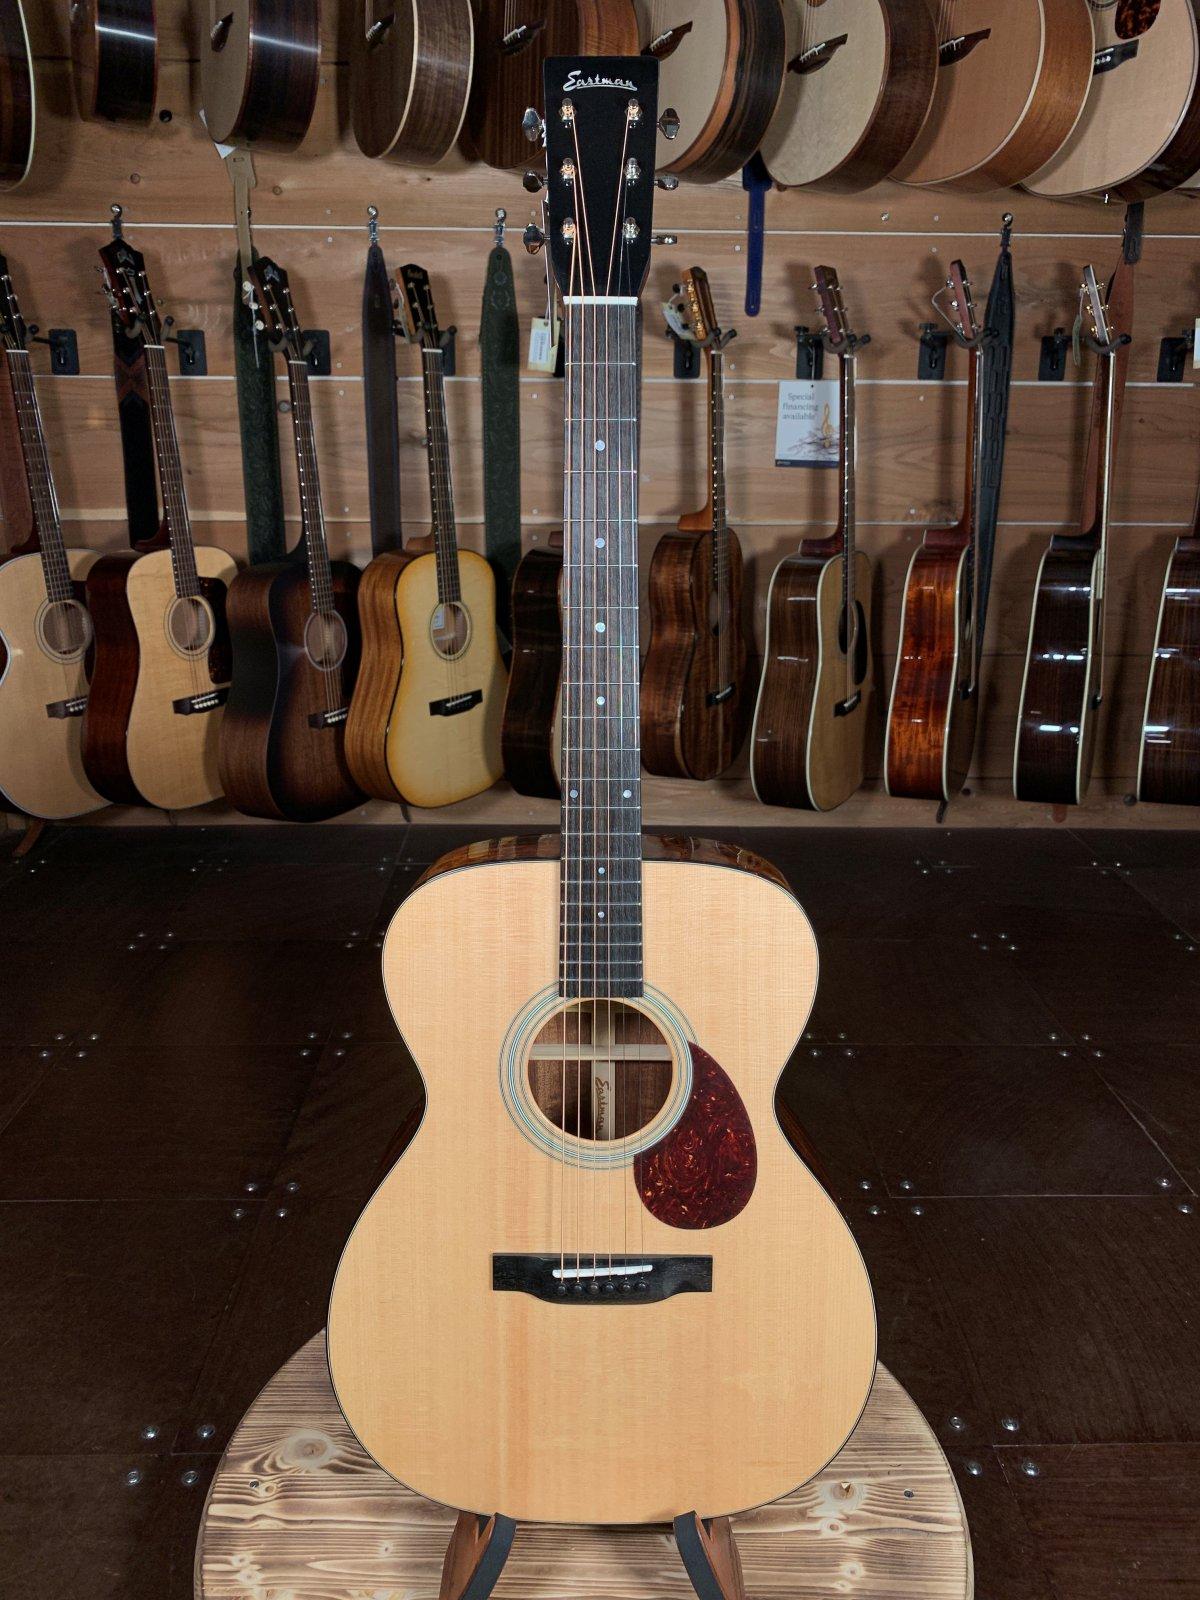 Eastman E6OM Natural Spruce/Mahogany Acoustic #5176